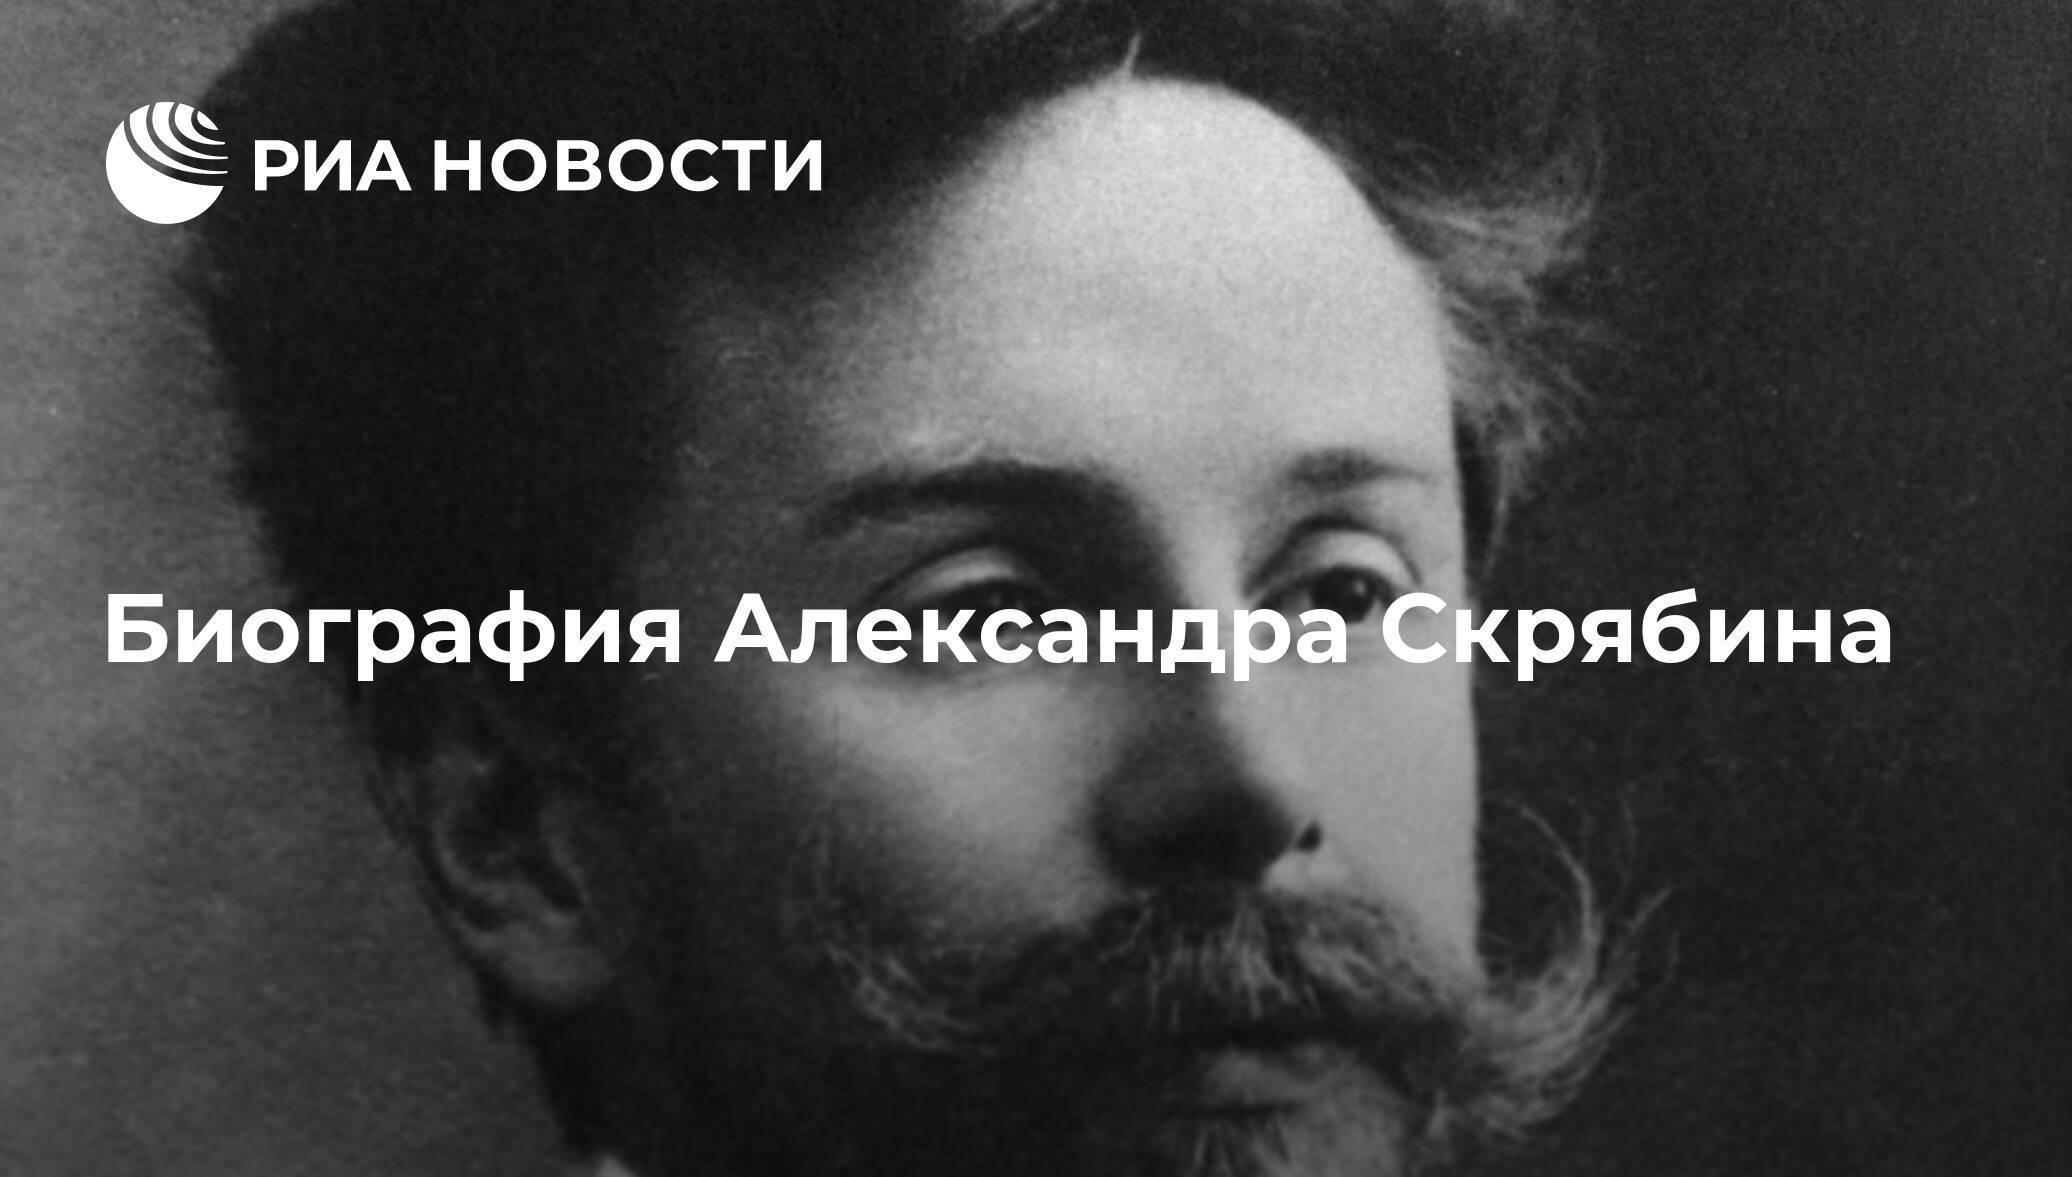 Александр николаевич скрябин (alexander scriabin)   belcanto.ru